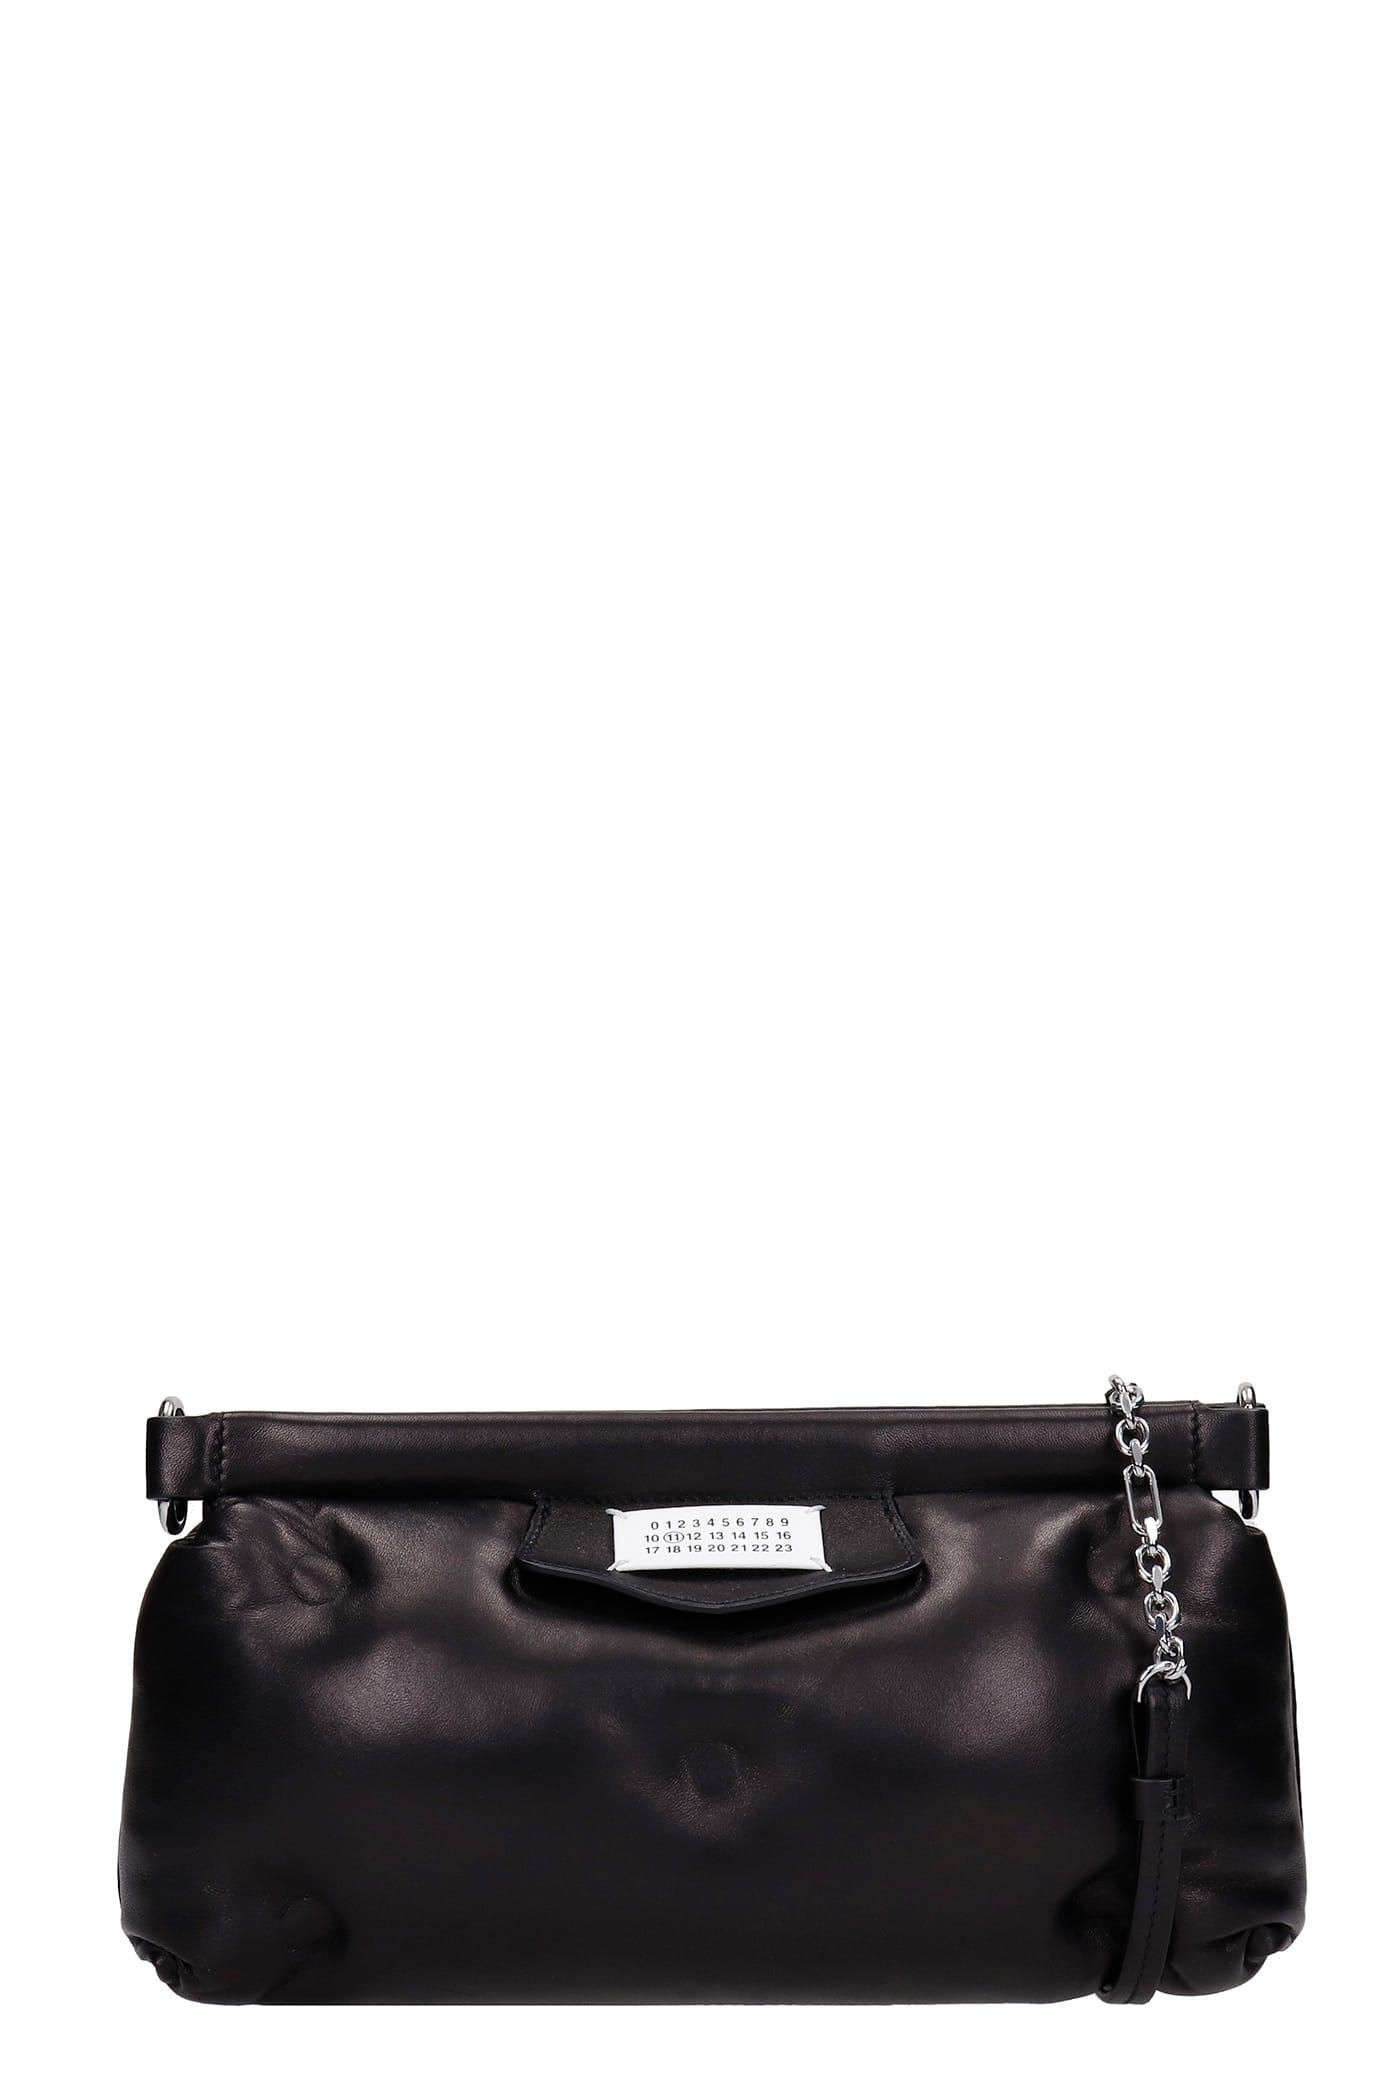 Maison Margiela Clutch In Black Leather